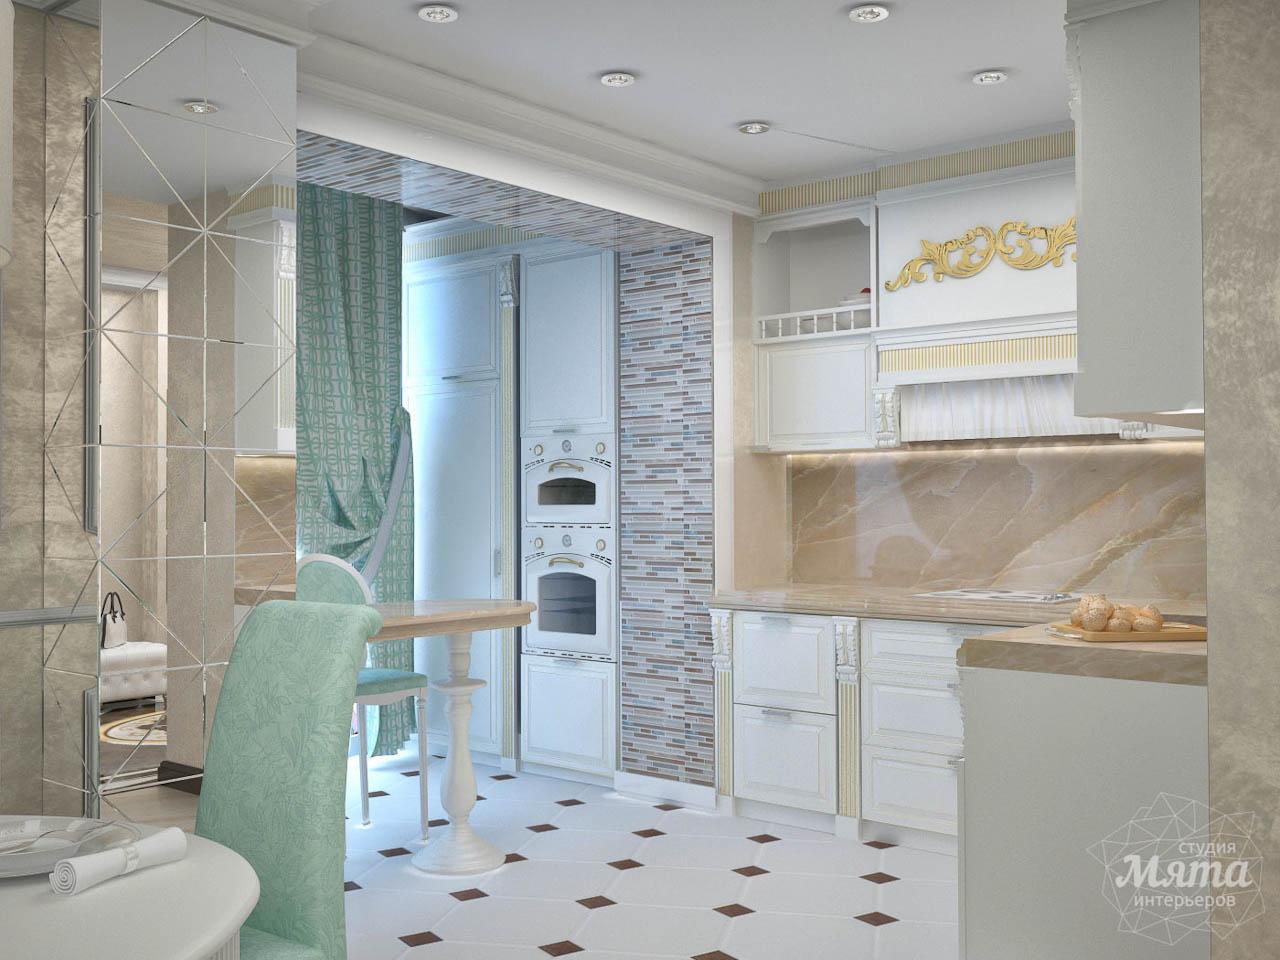 Дизайн интерьера и ремонт трехкомнатной квартиры по ул. 8 Марта 190 img1160288683